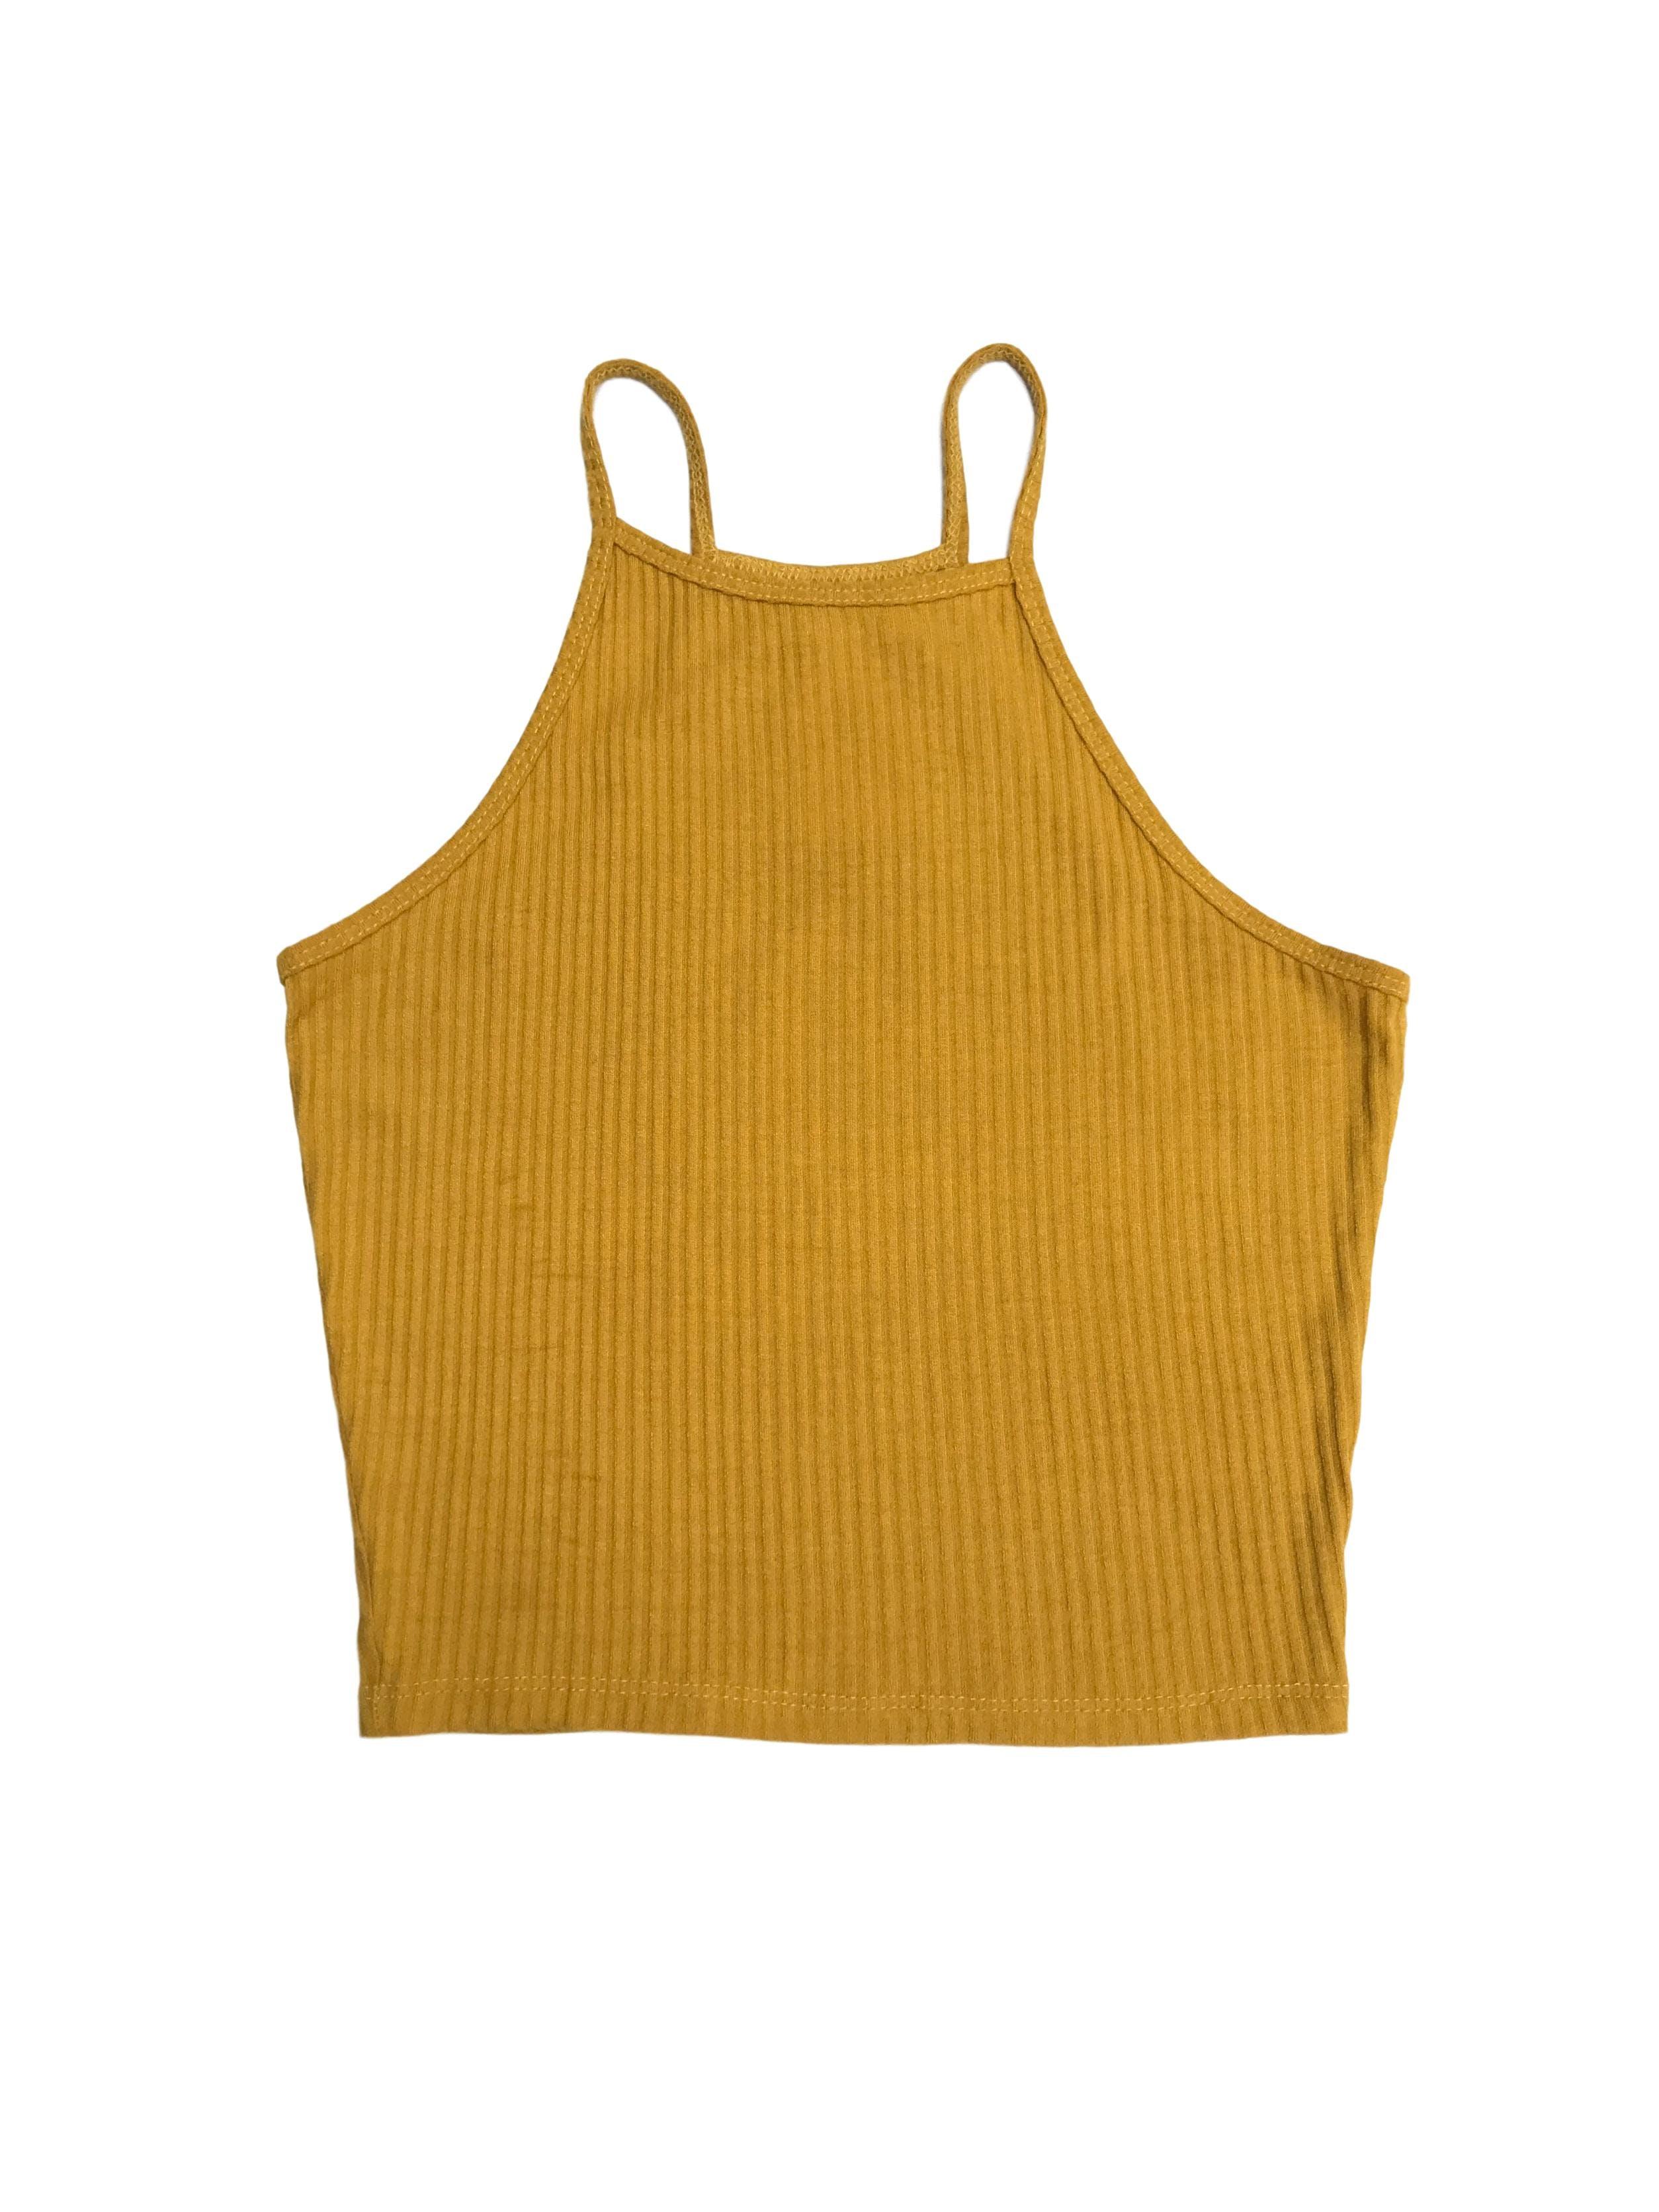 Polo corto amarillo con líneas al tono